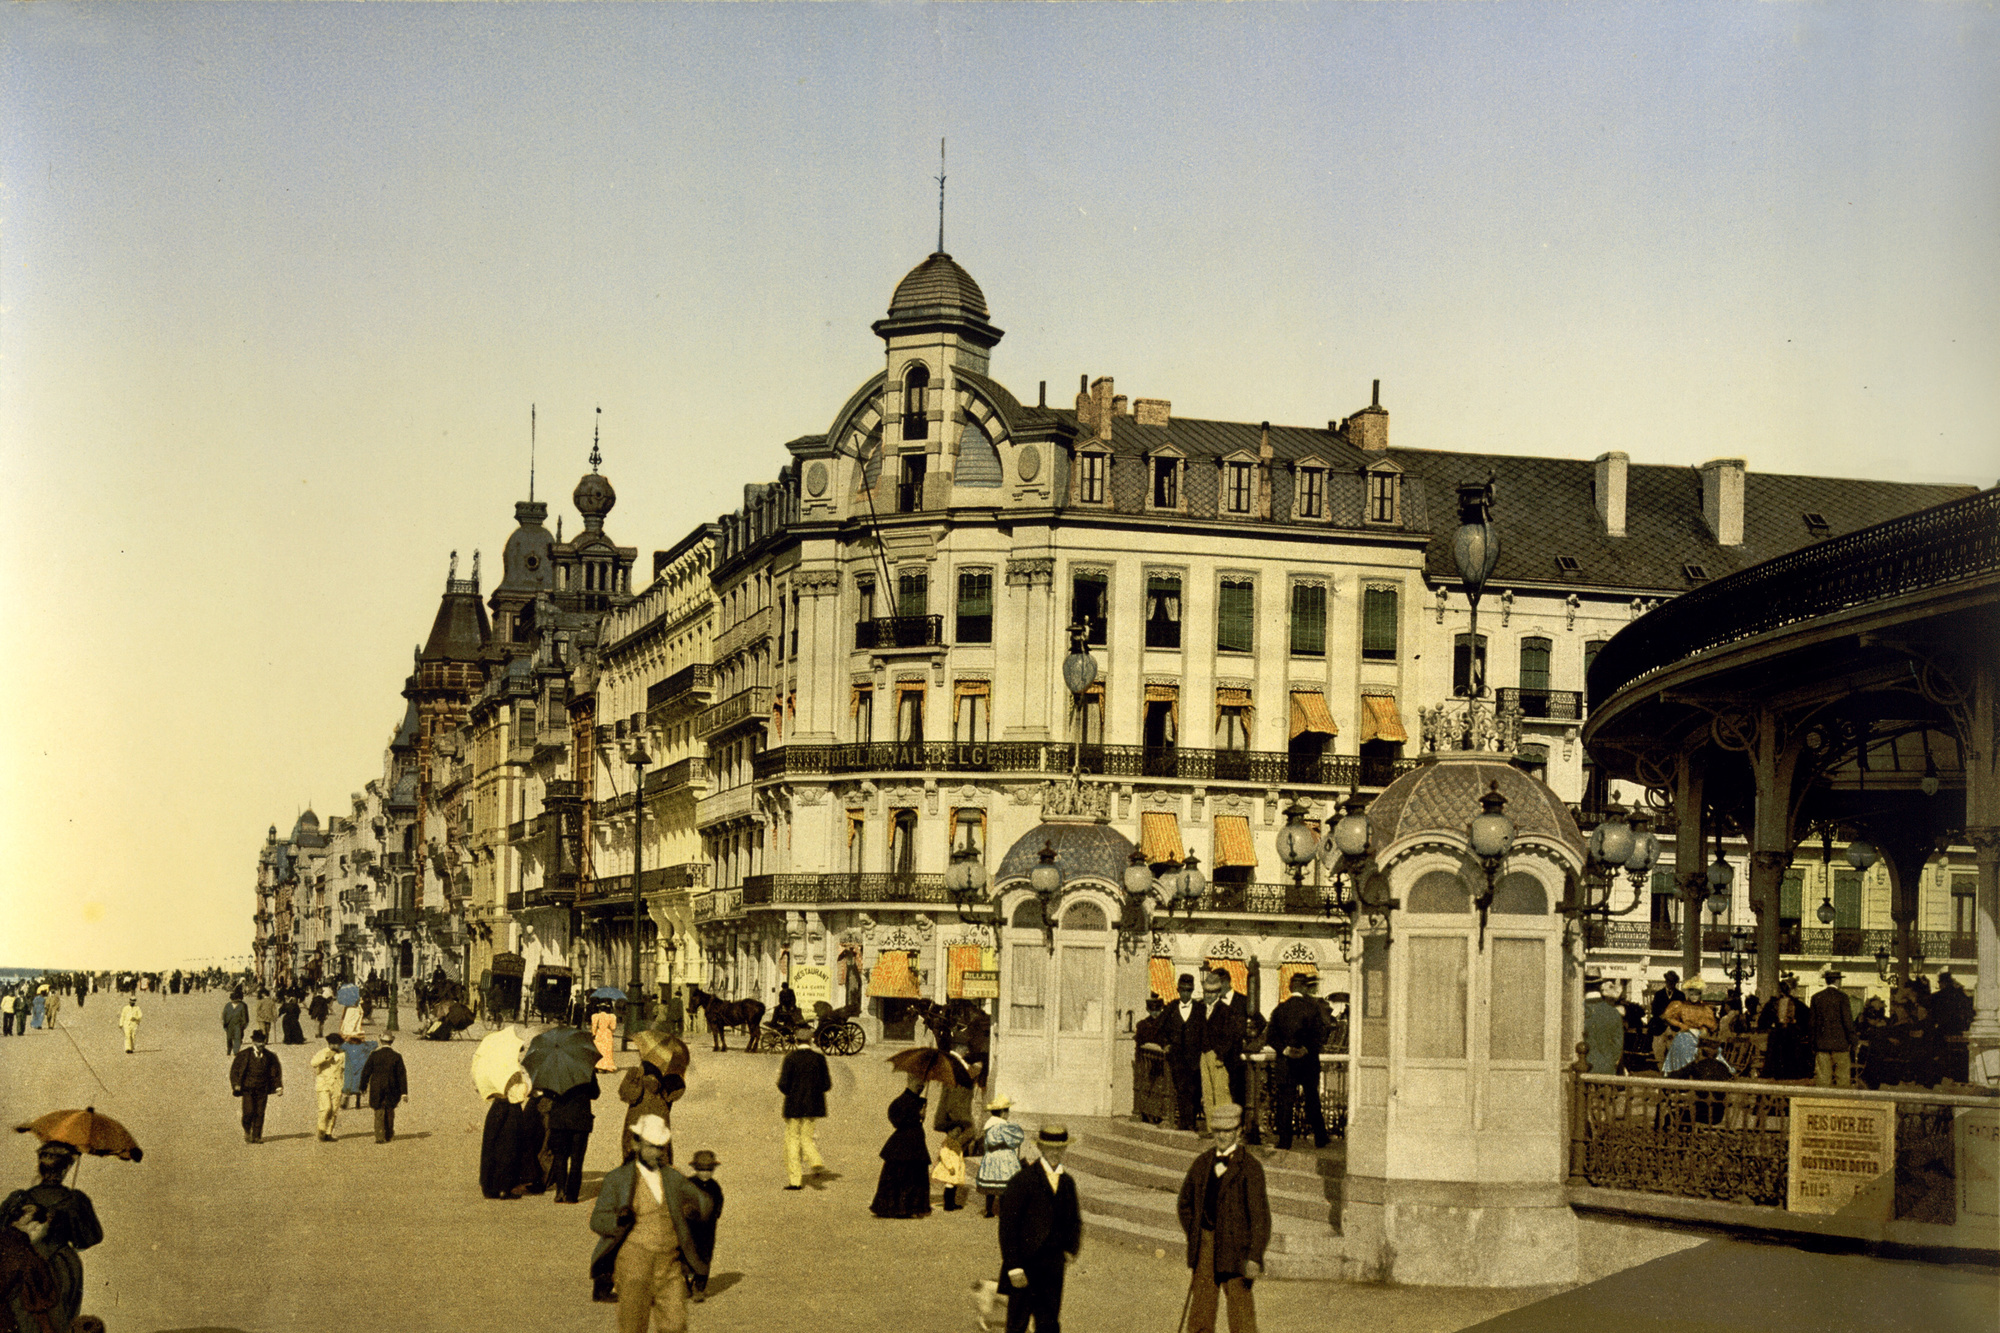 La digue d'Ostende (vers 1895), Inconnu